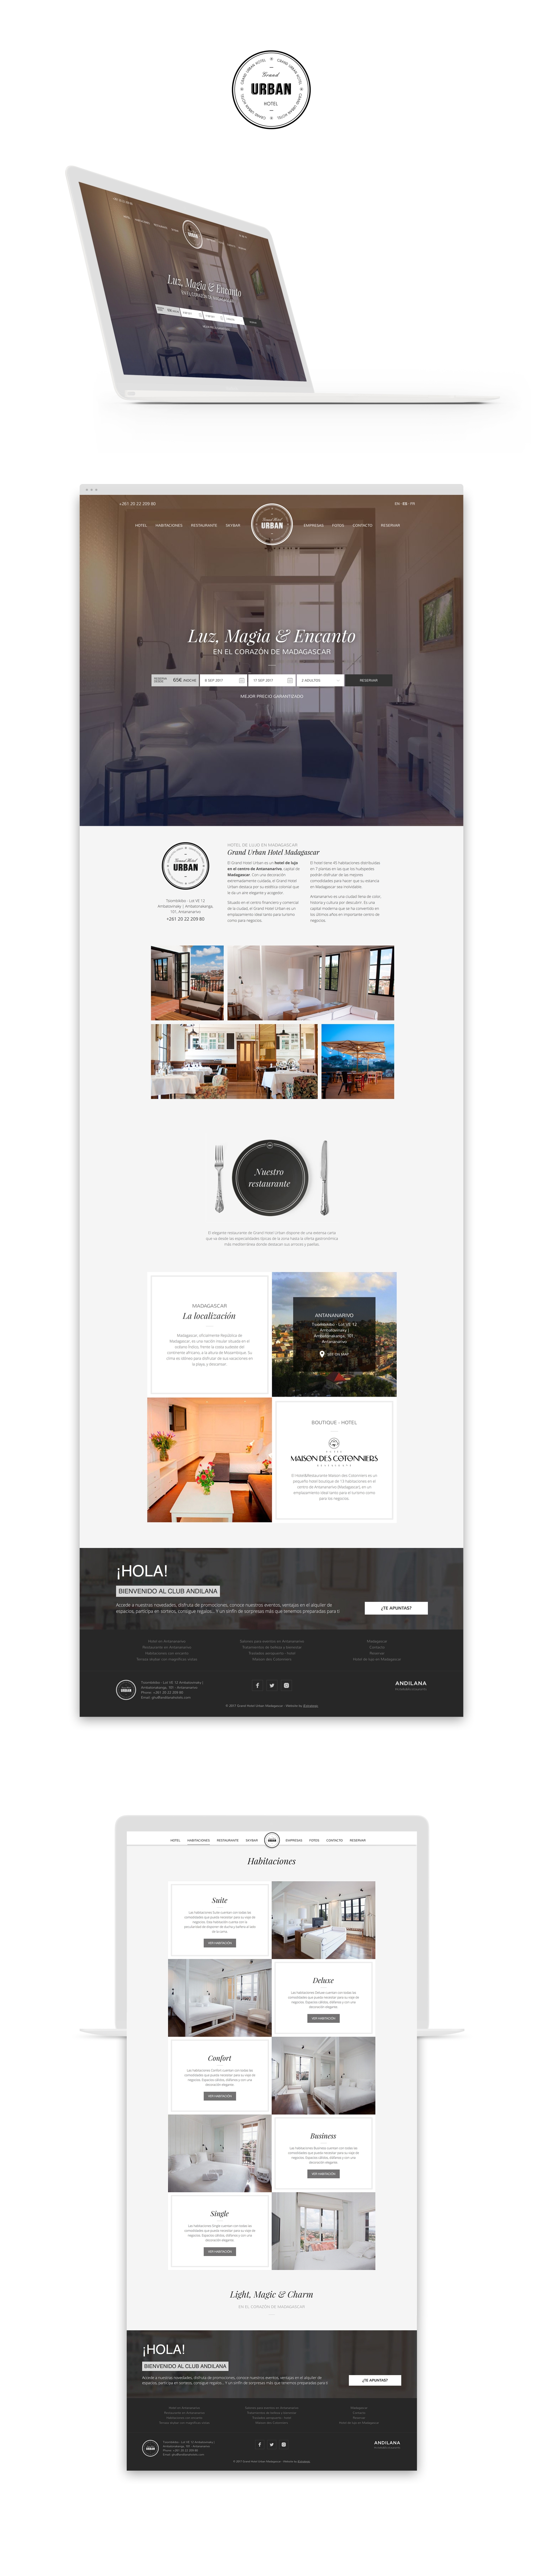 Diseño web · Grand Hotel Urban · Samuel Matito · diseñador freelance